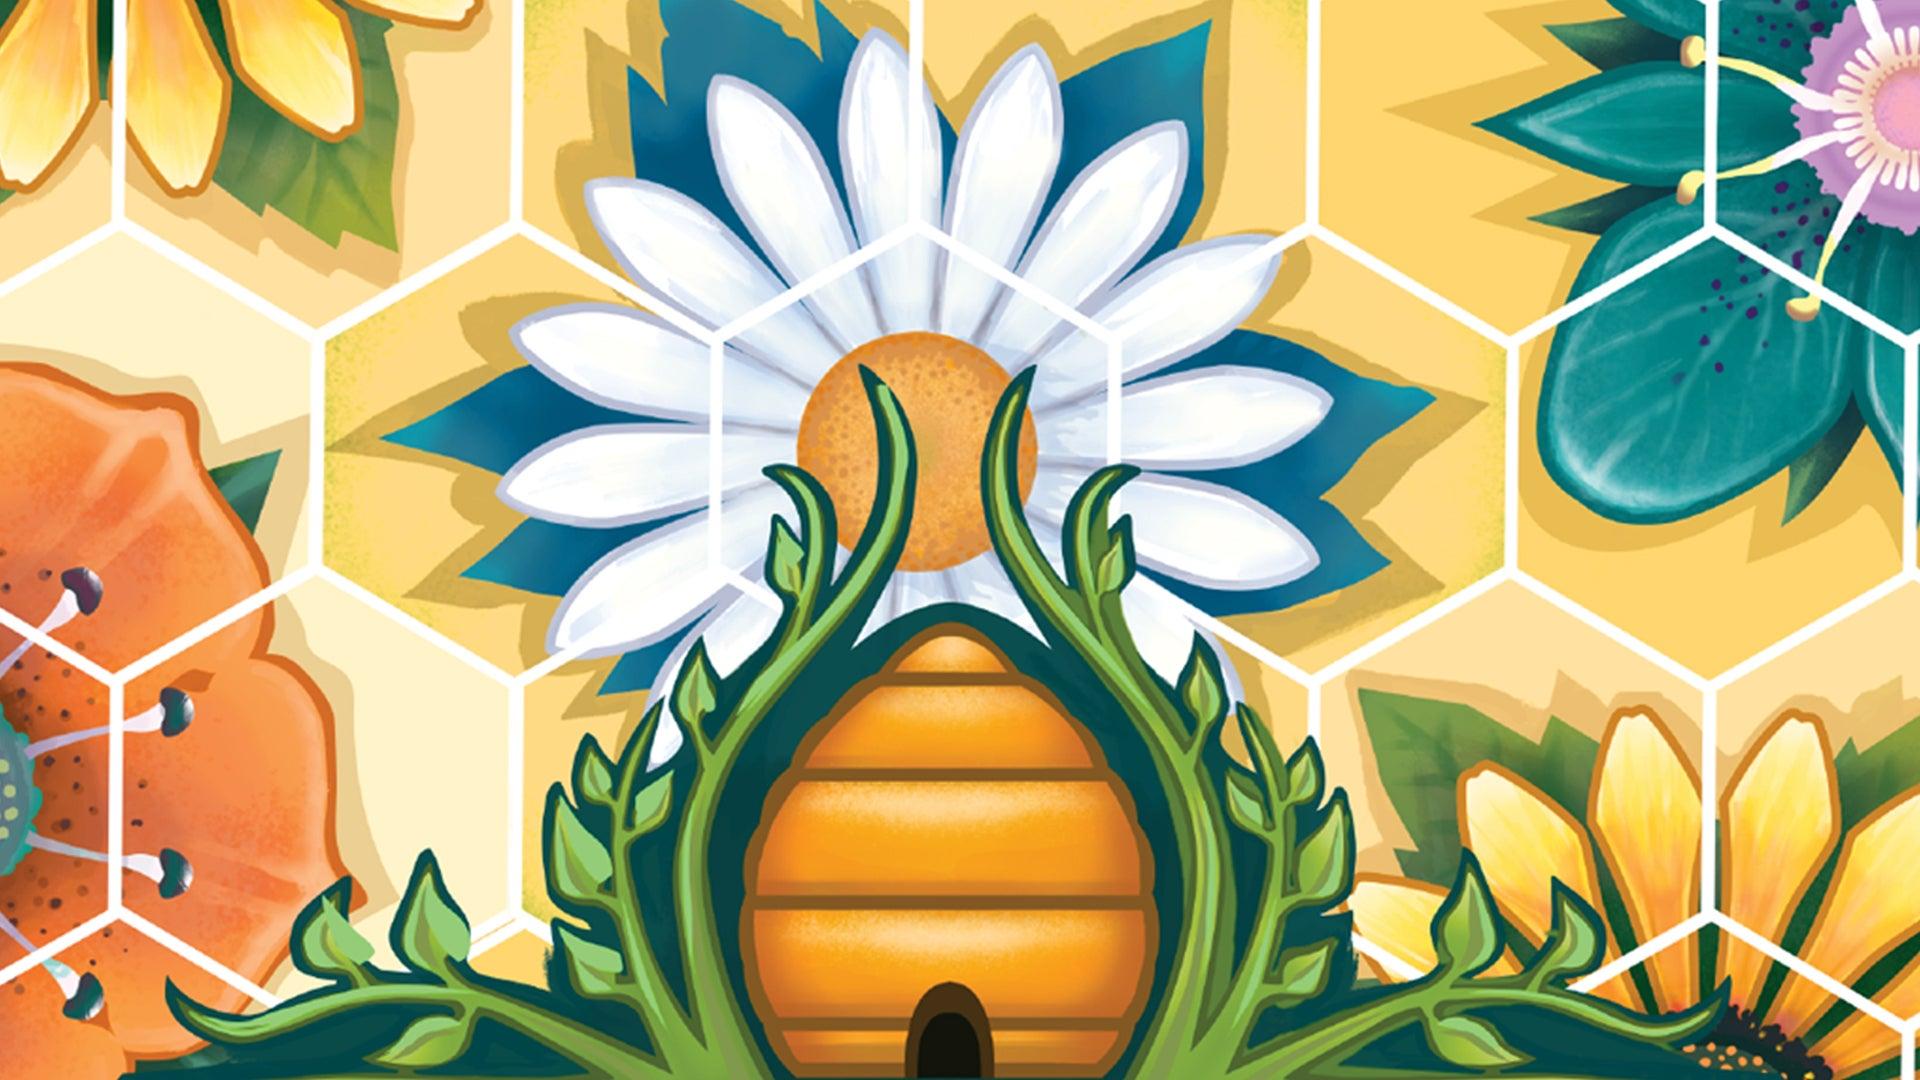 Beez board game artwork